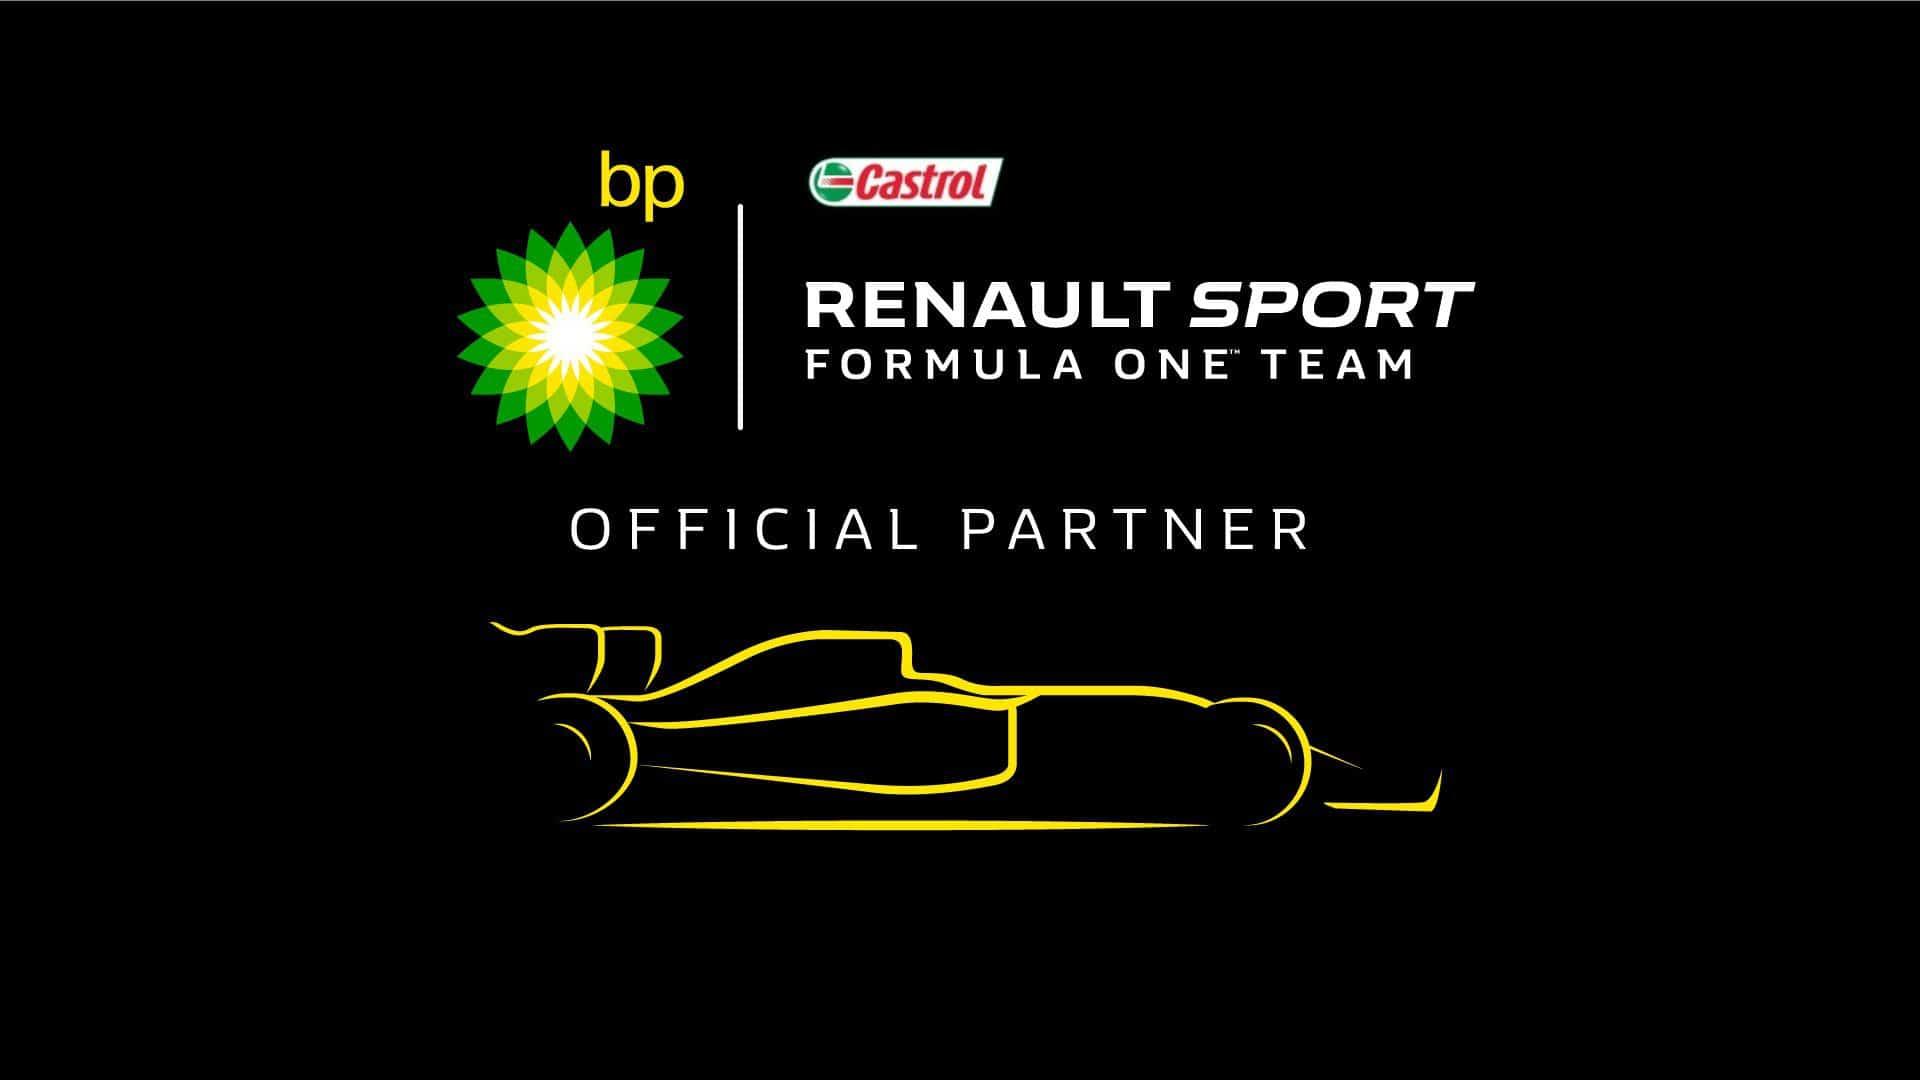 Renault-BP-Partner F1 2018 Castrol